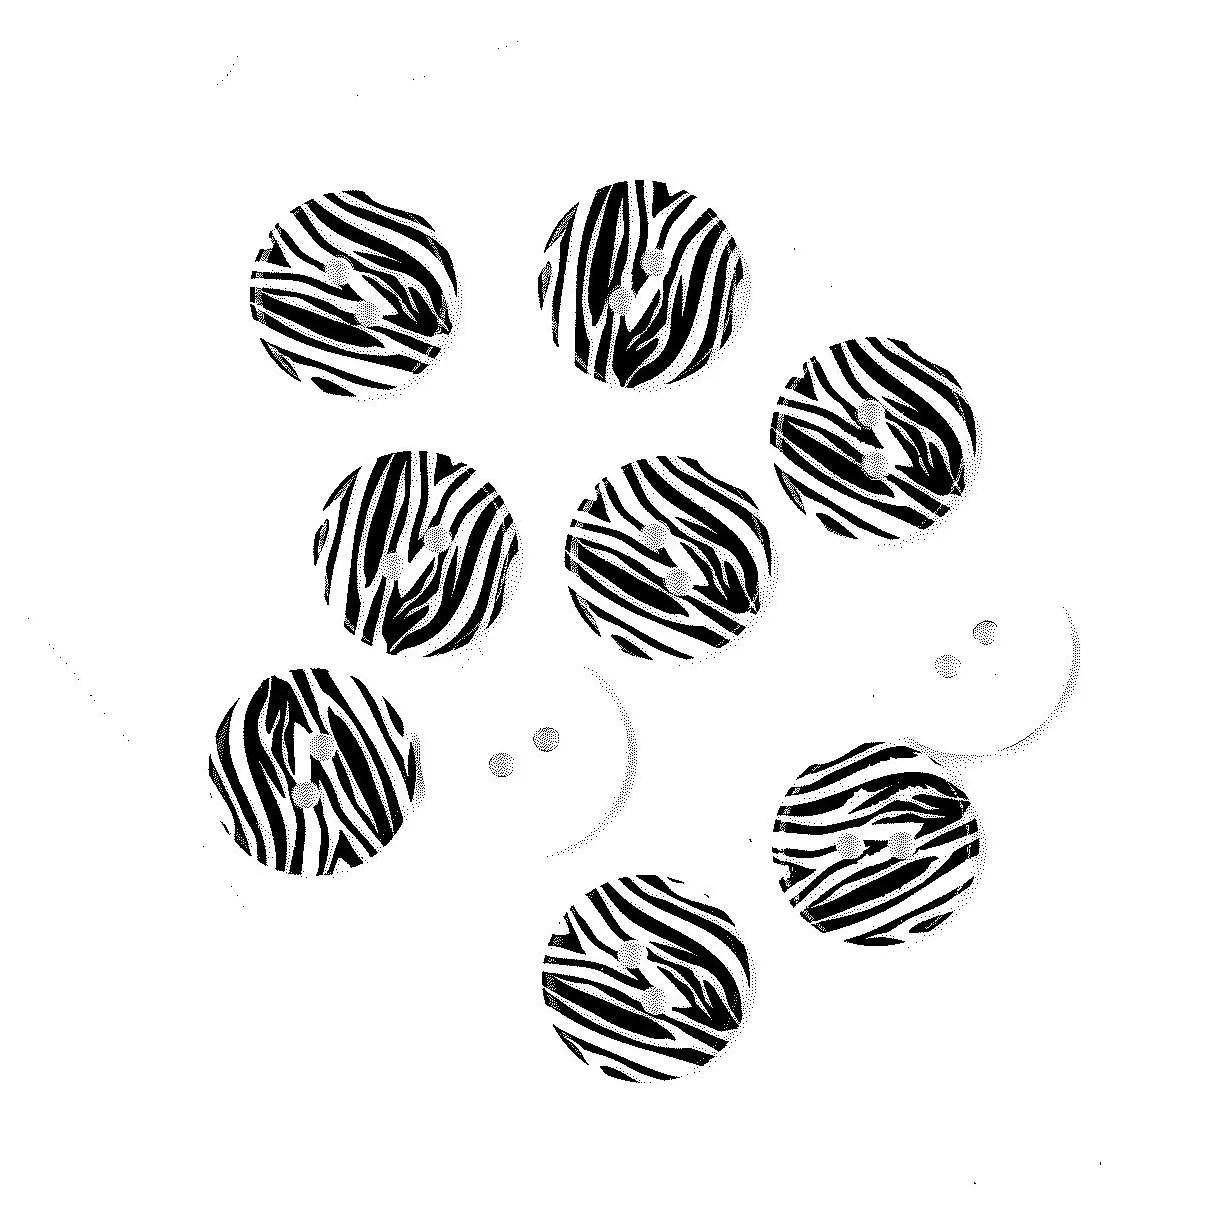 Destash 10 White Zebra Buttons plastic animal print for